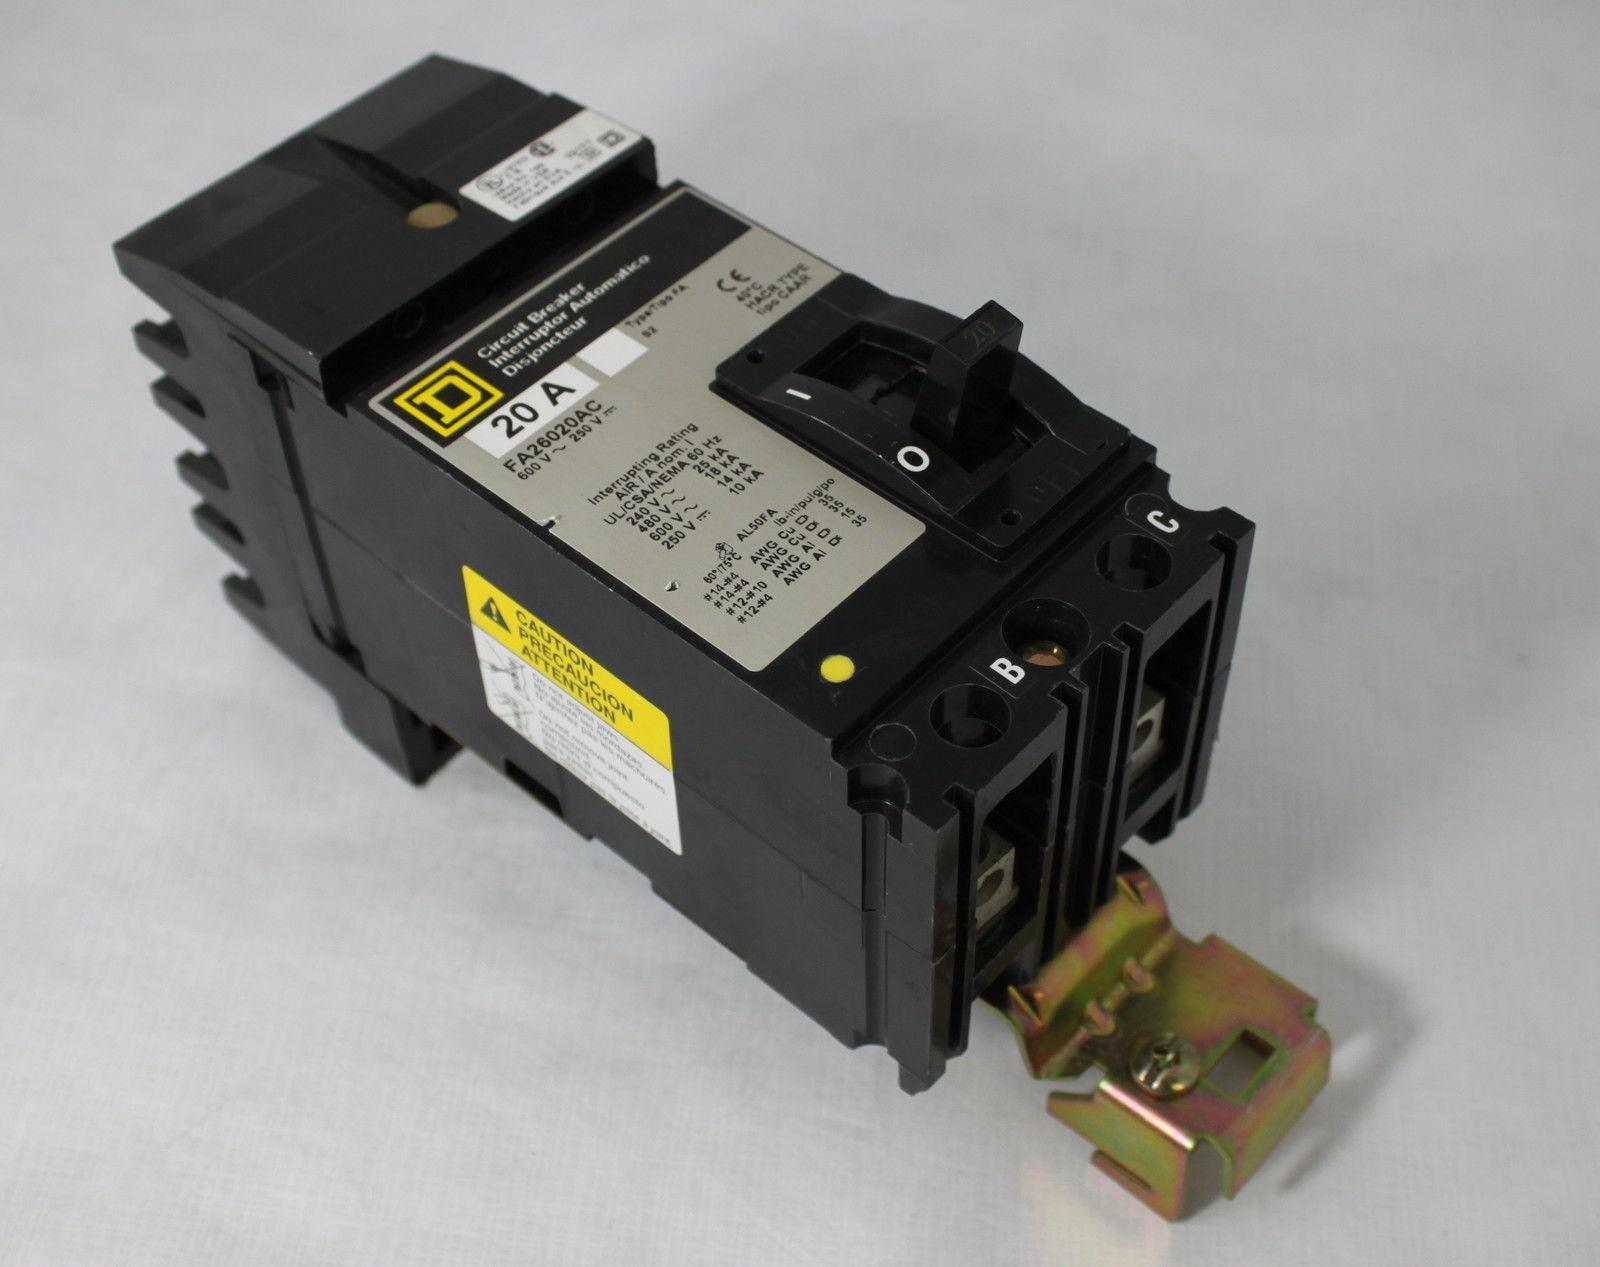 Square D 20A Circuit Breaker Interruptor FA26020AC Type FA 600V CAAR image 3